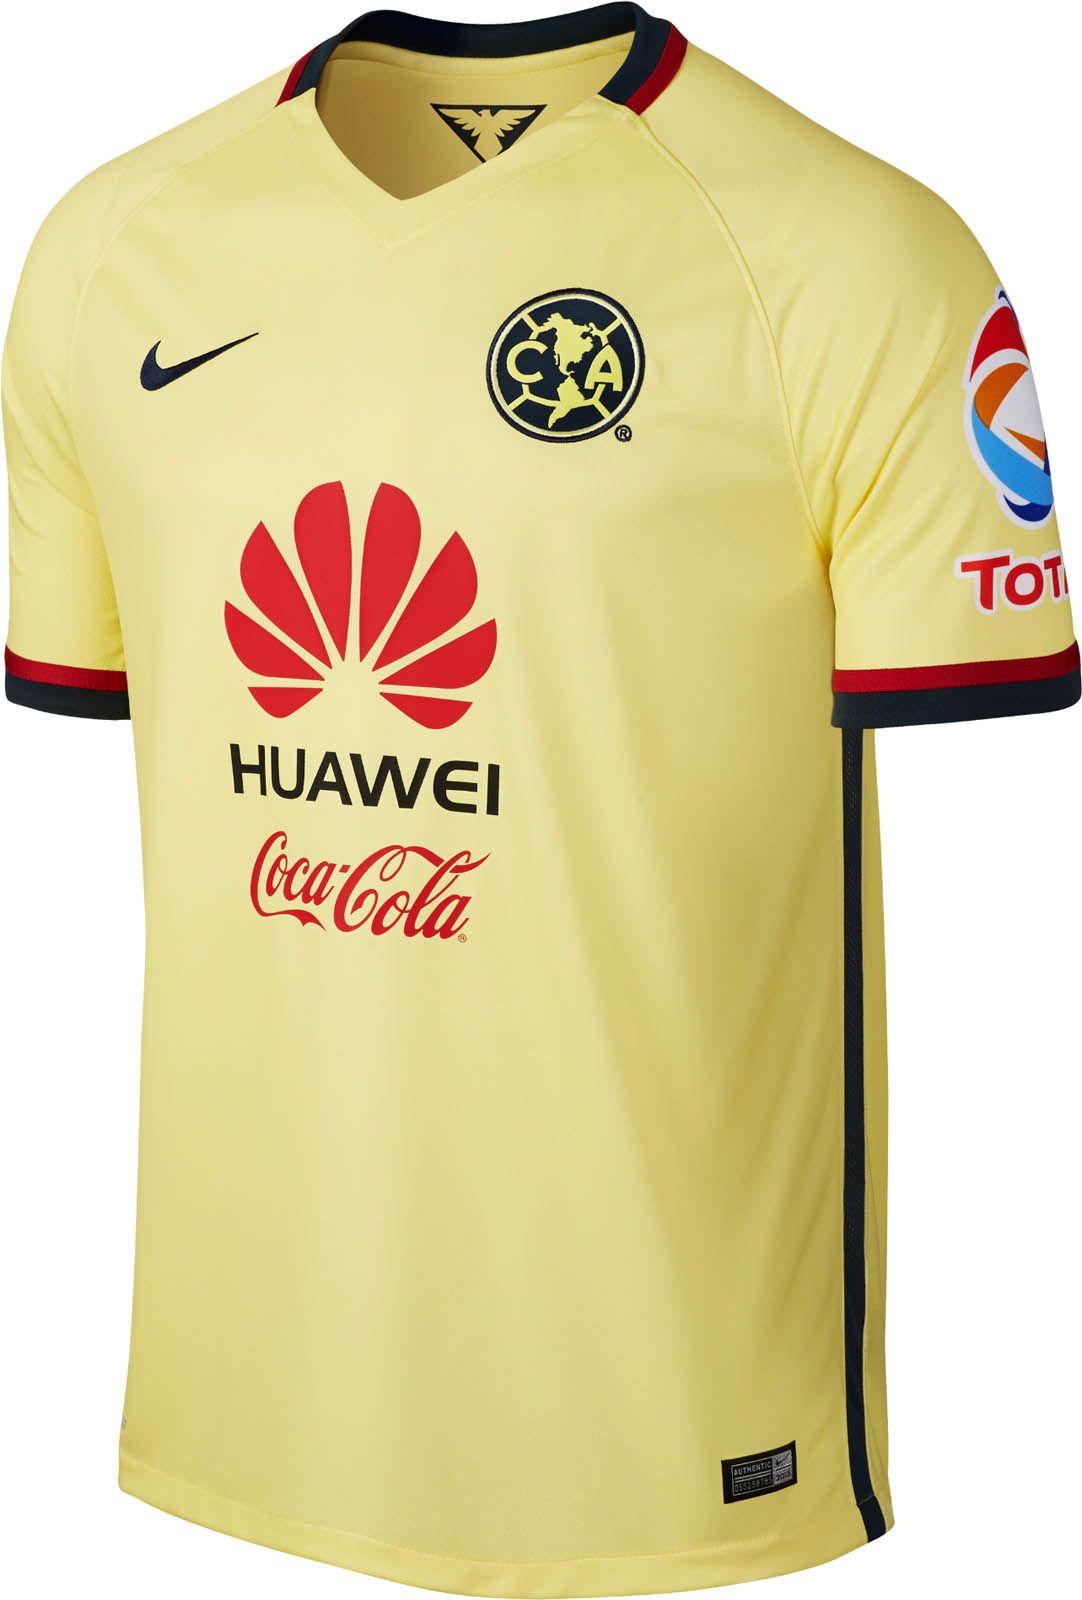 Club de Fútbol América (Mexico) - 2015 2016 Nike Home Shirt ... d22d6c4d8644d